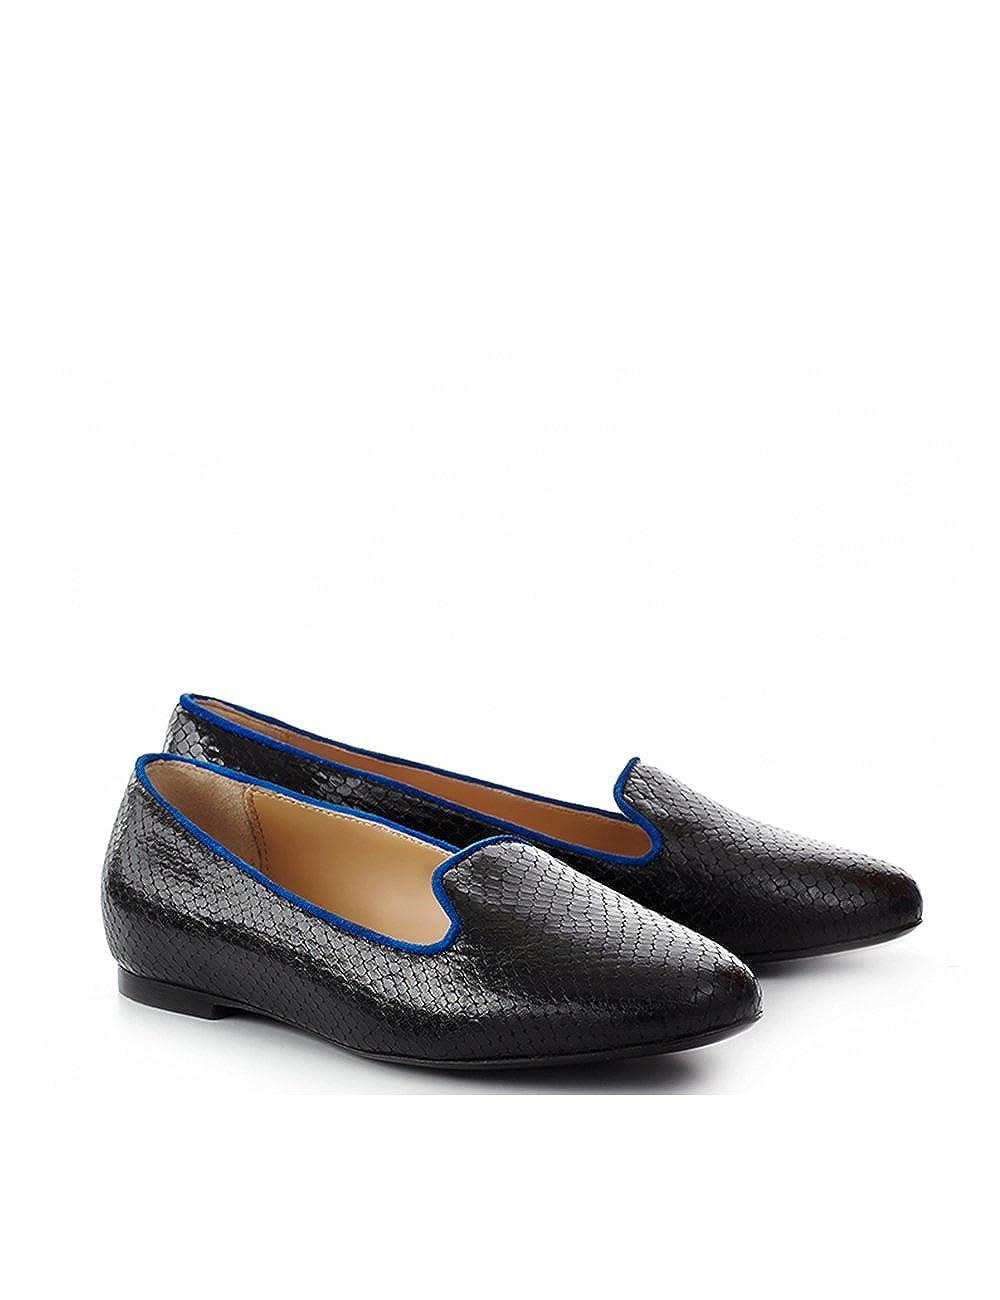 ShoeVita handgefertigte Loafer Damen Leder Slipper Python